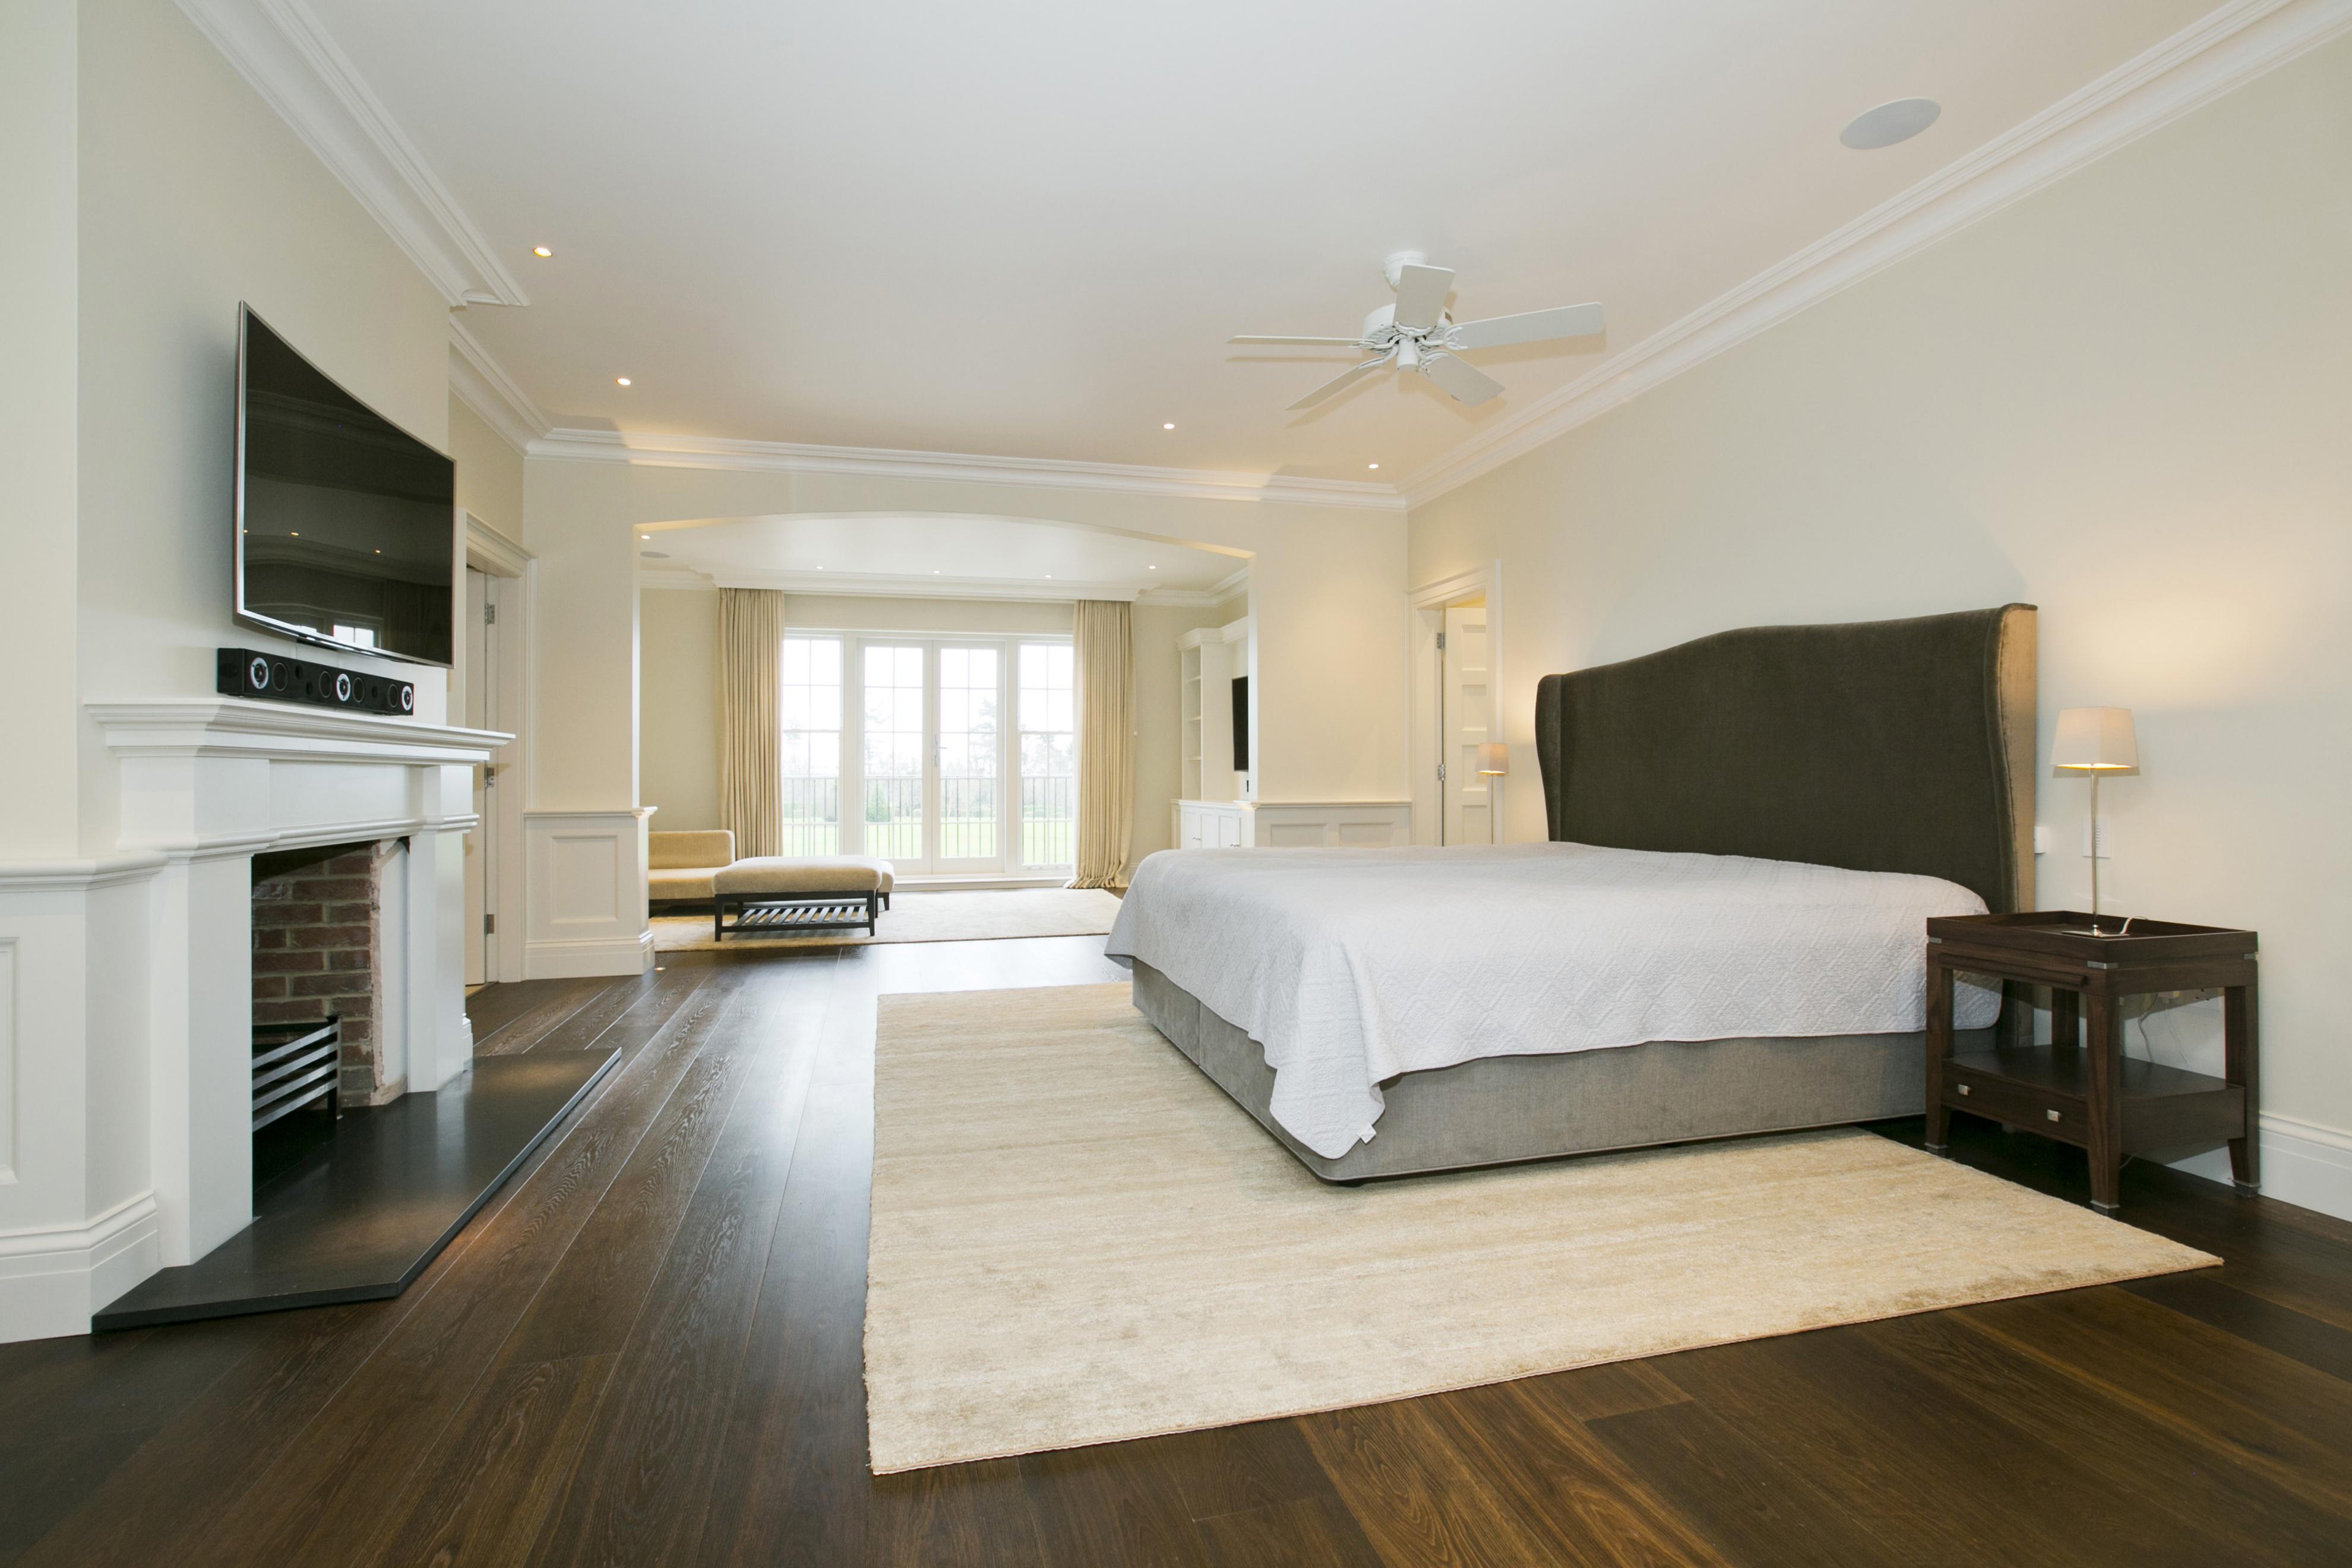 silk carpet and wood flooring